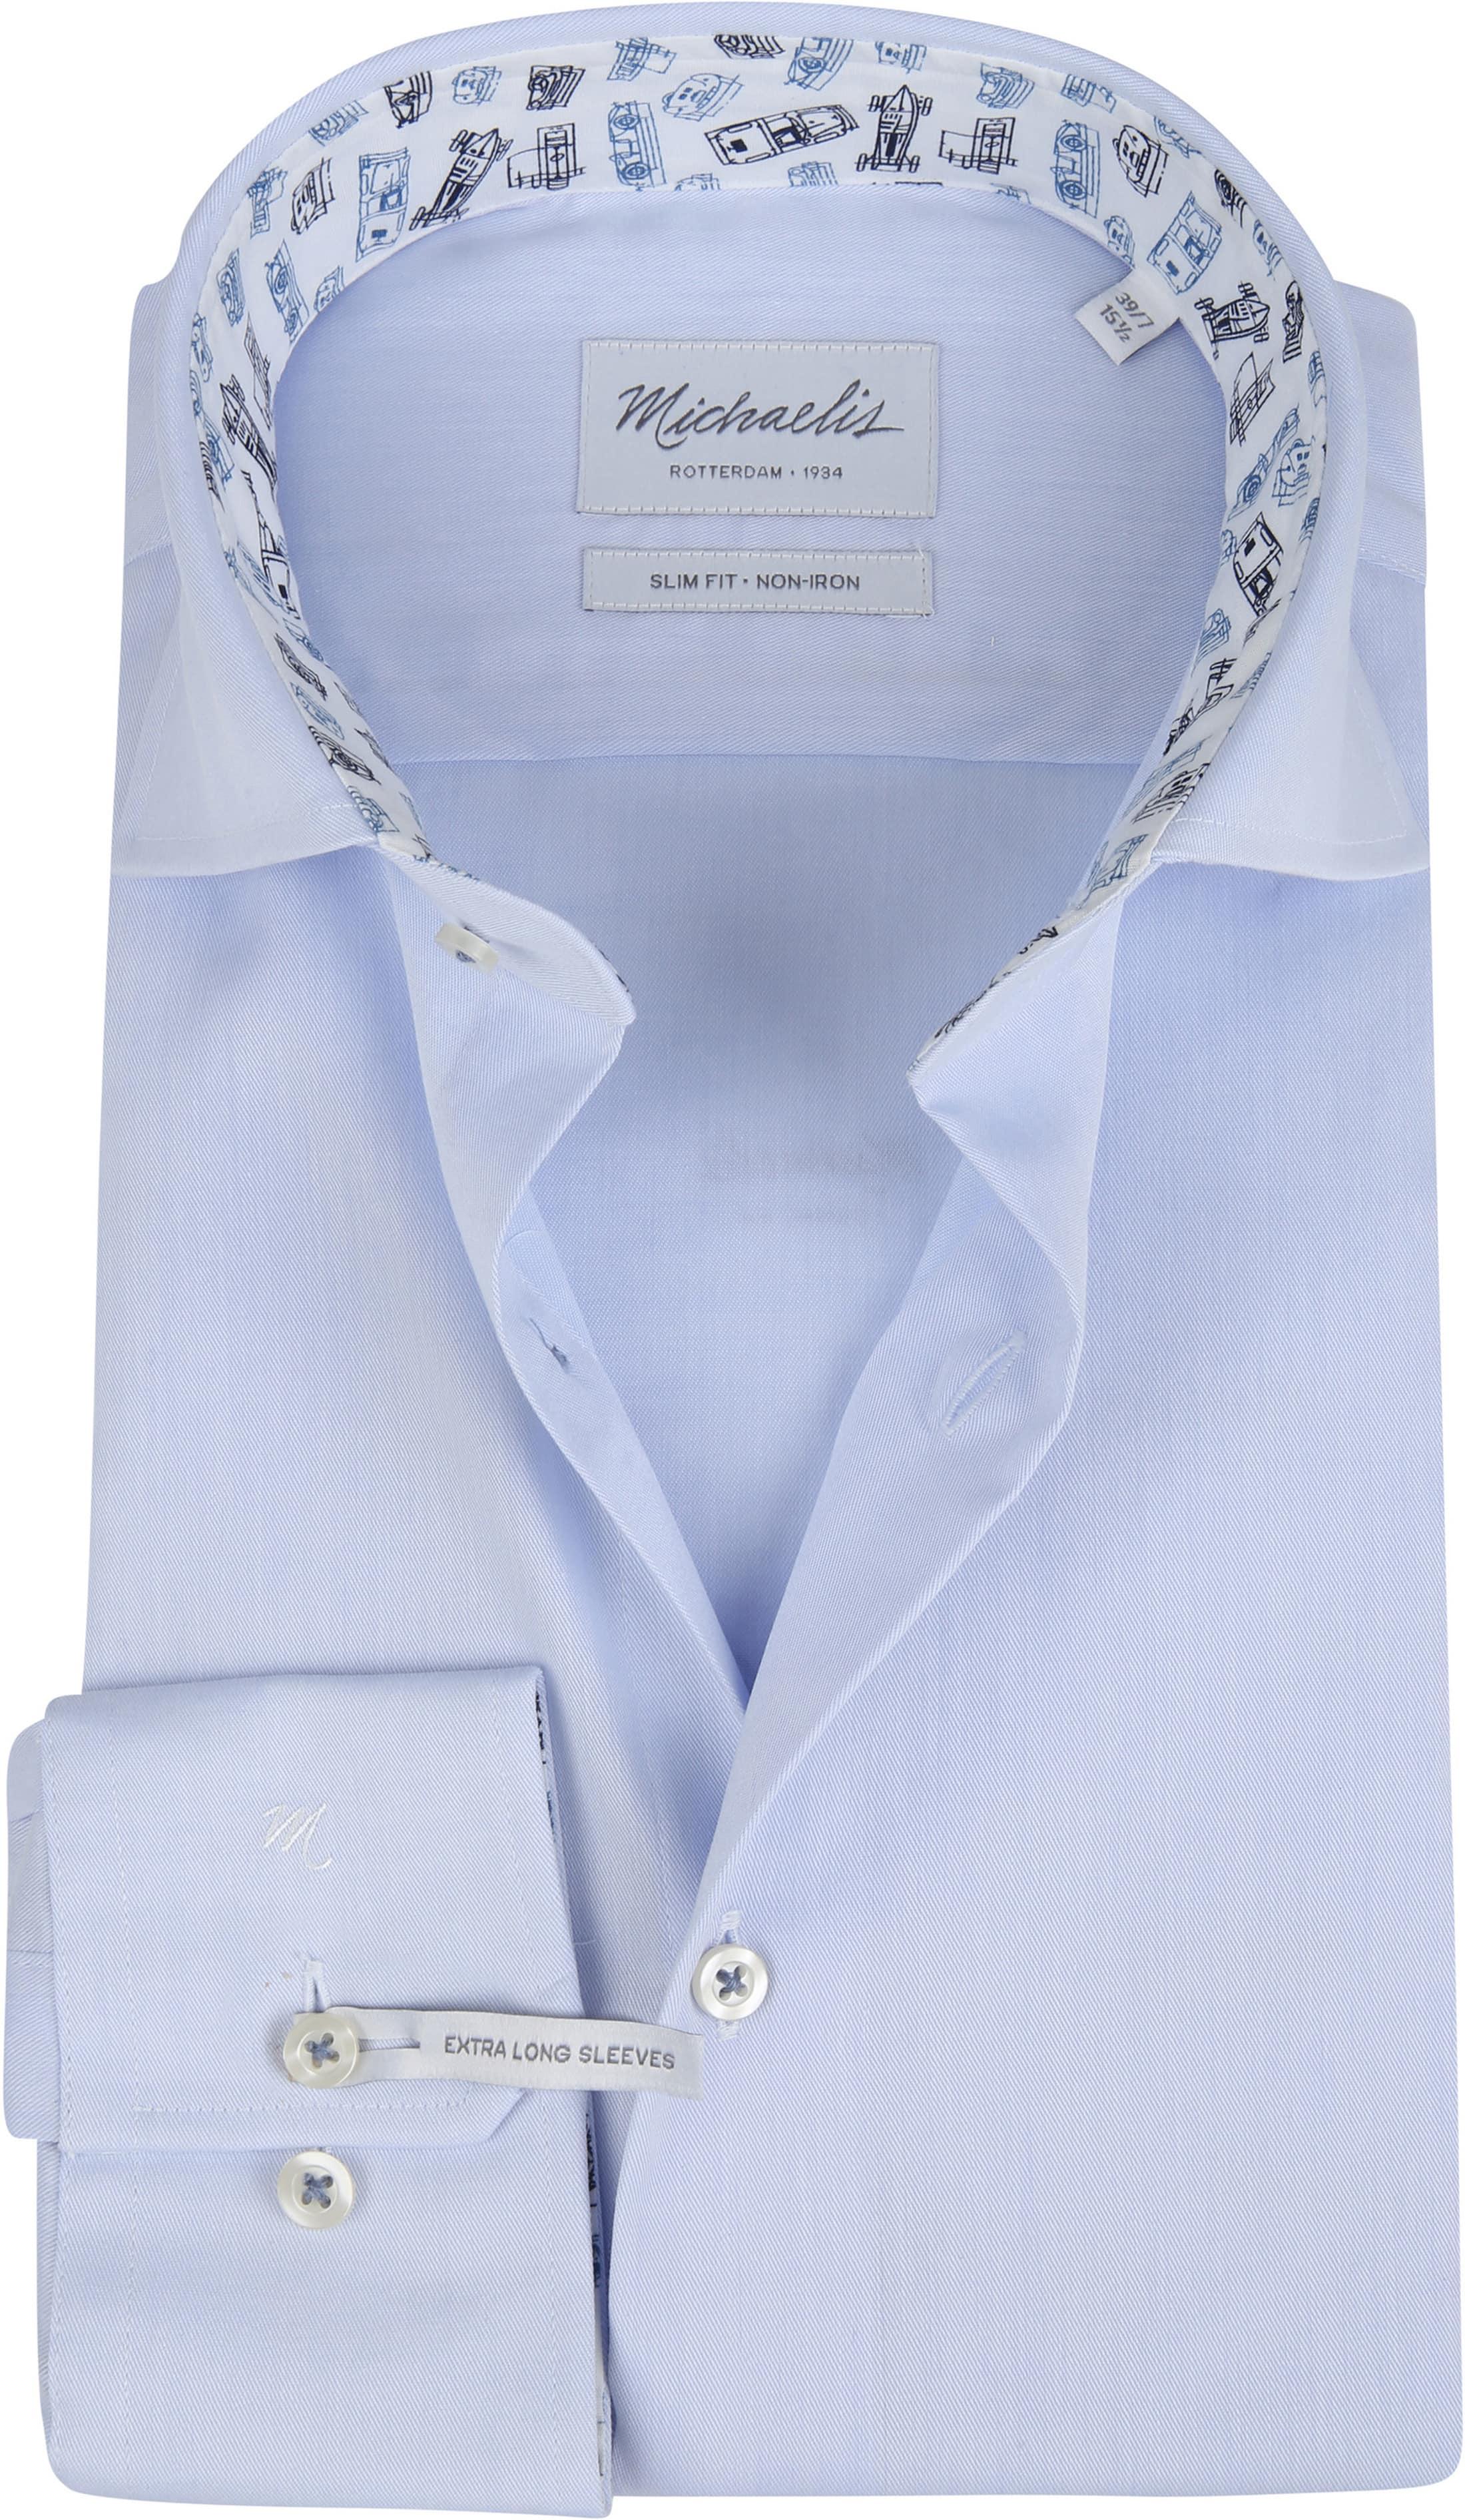 Michaelis Shirt SL7 Blue  foto 0